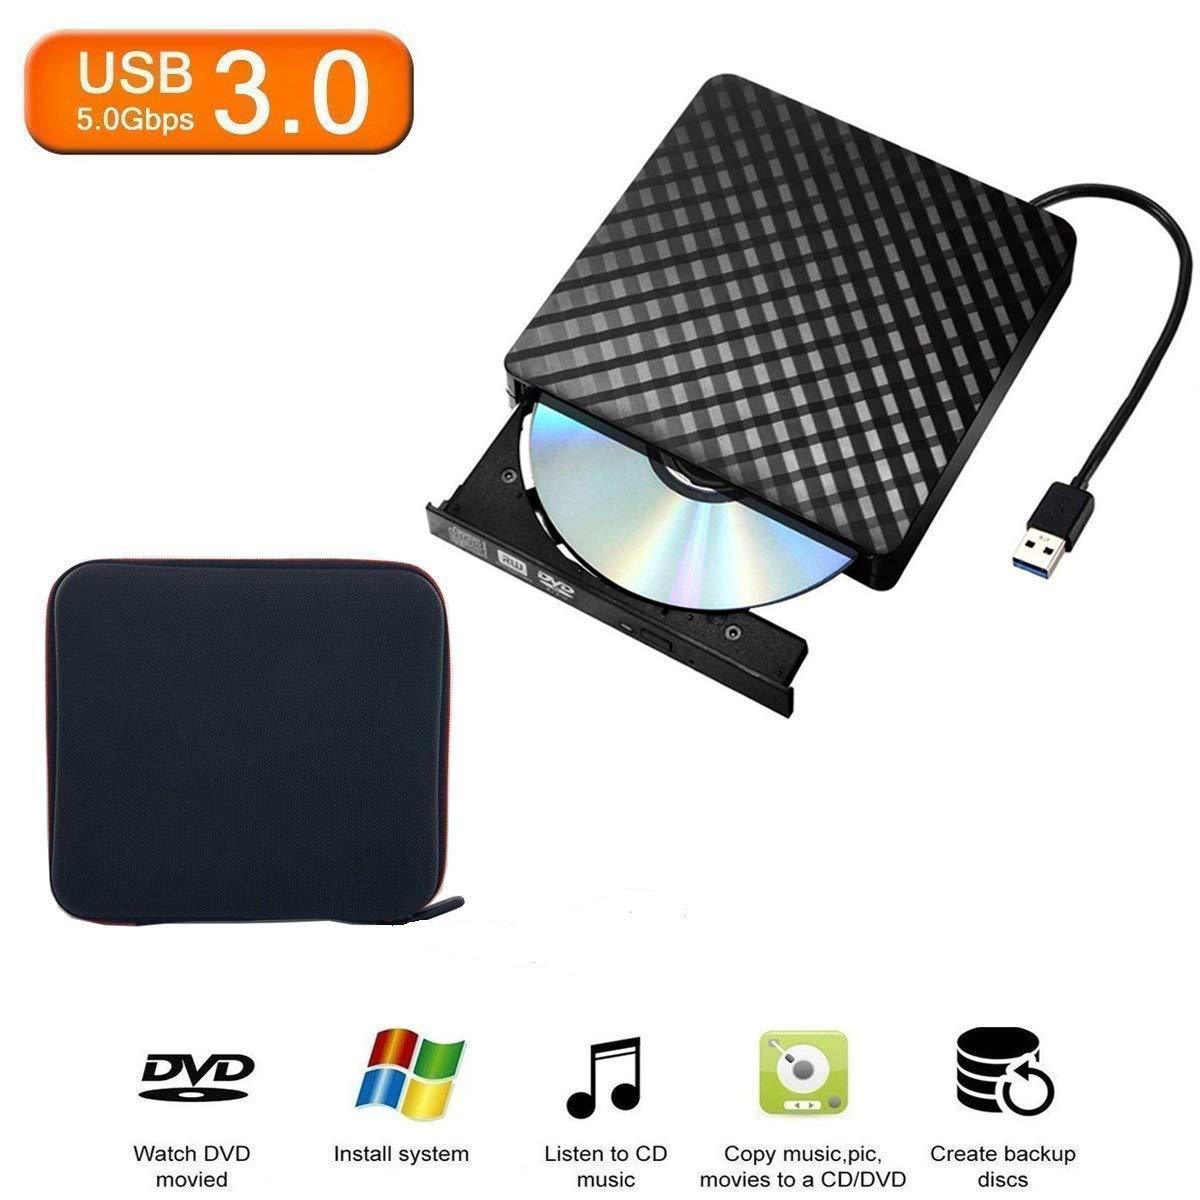 Tecnugiz External DVD Drive USB 3.0, CD DVD Burner